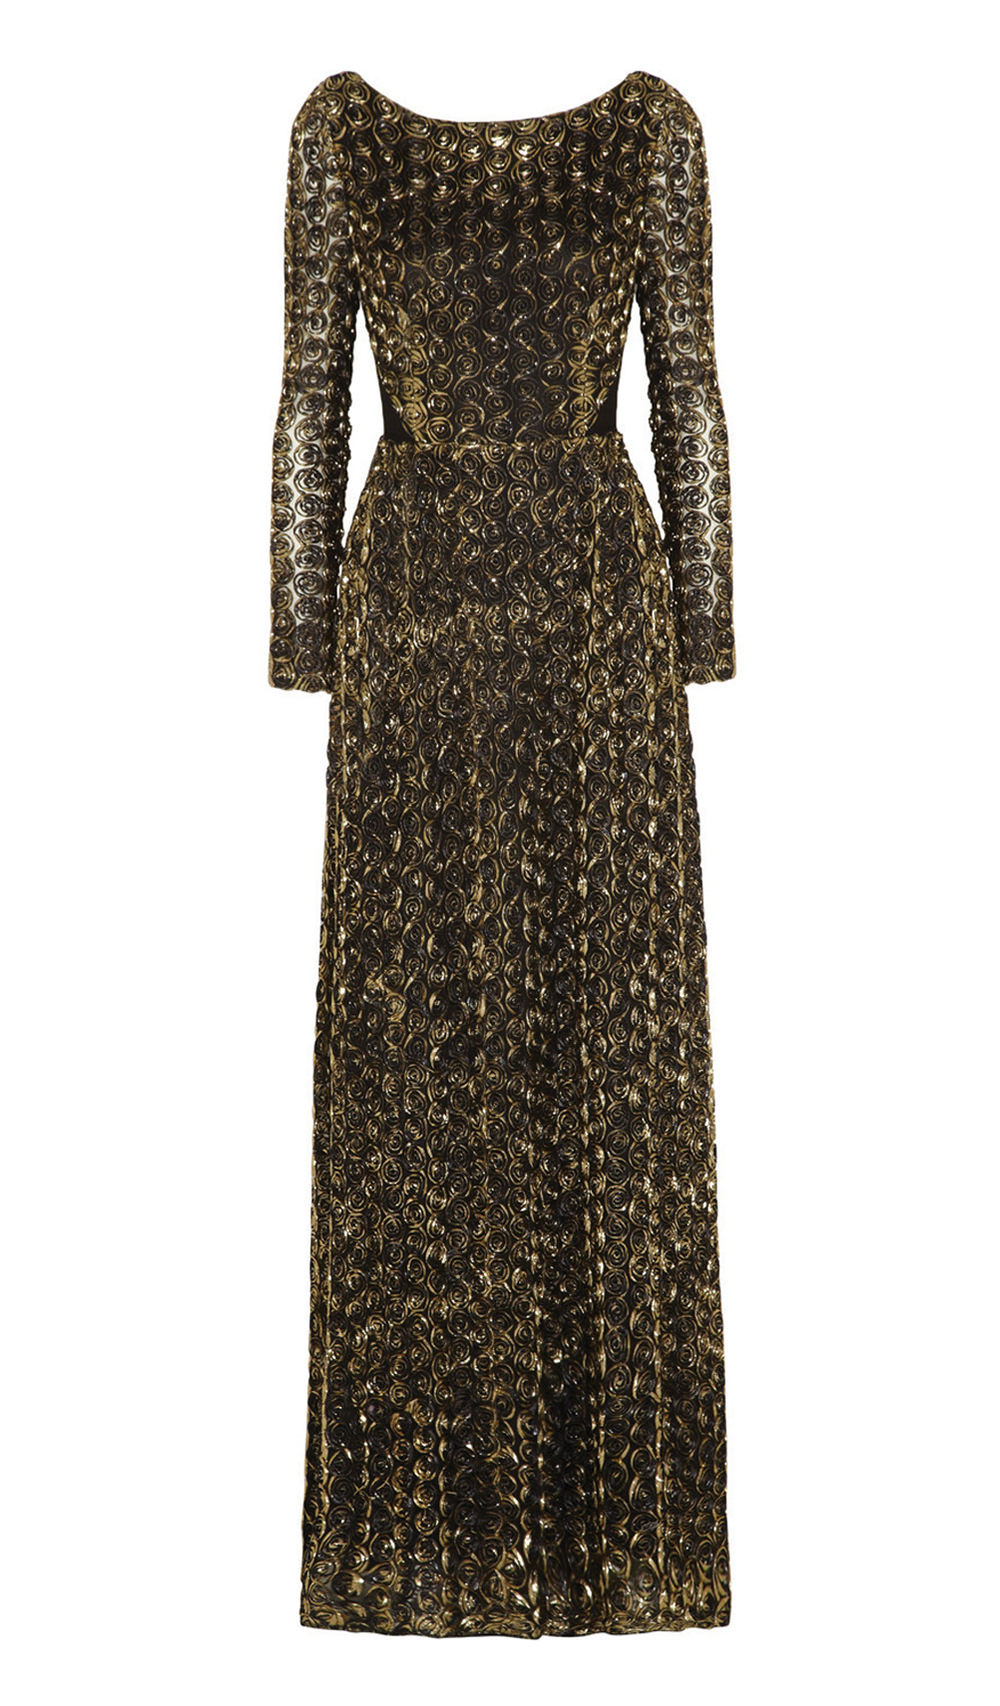 Temperley London Long Donna DressUS$950